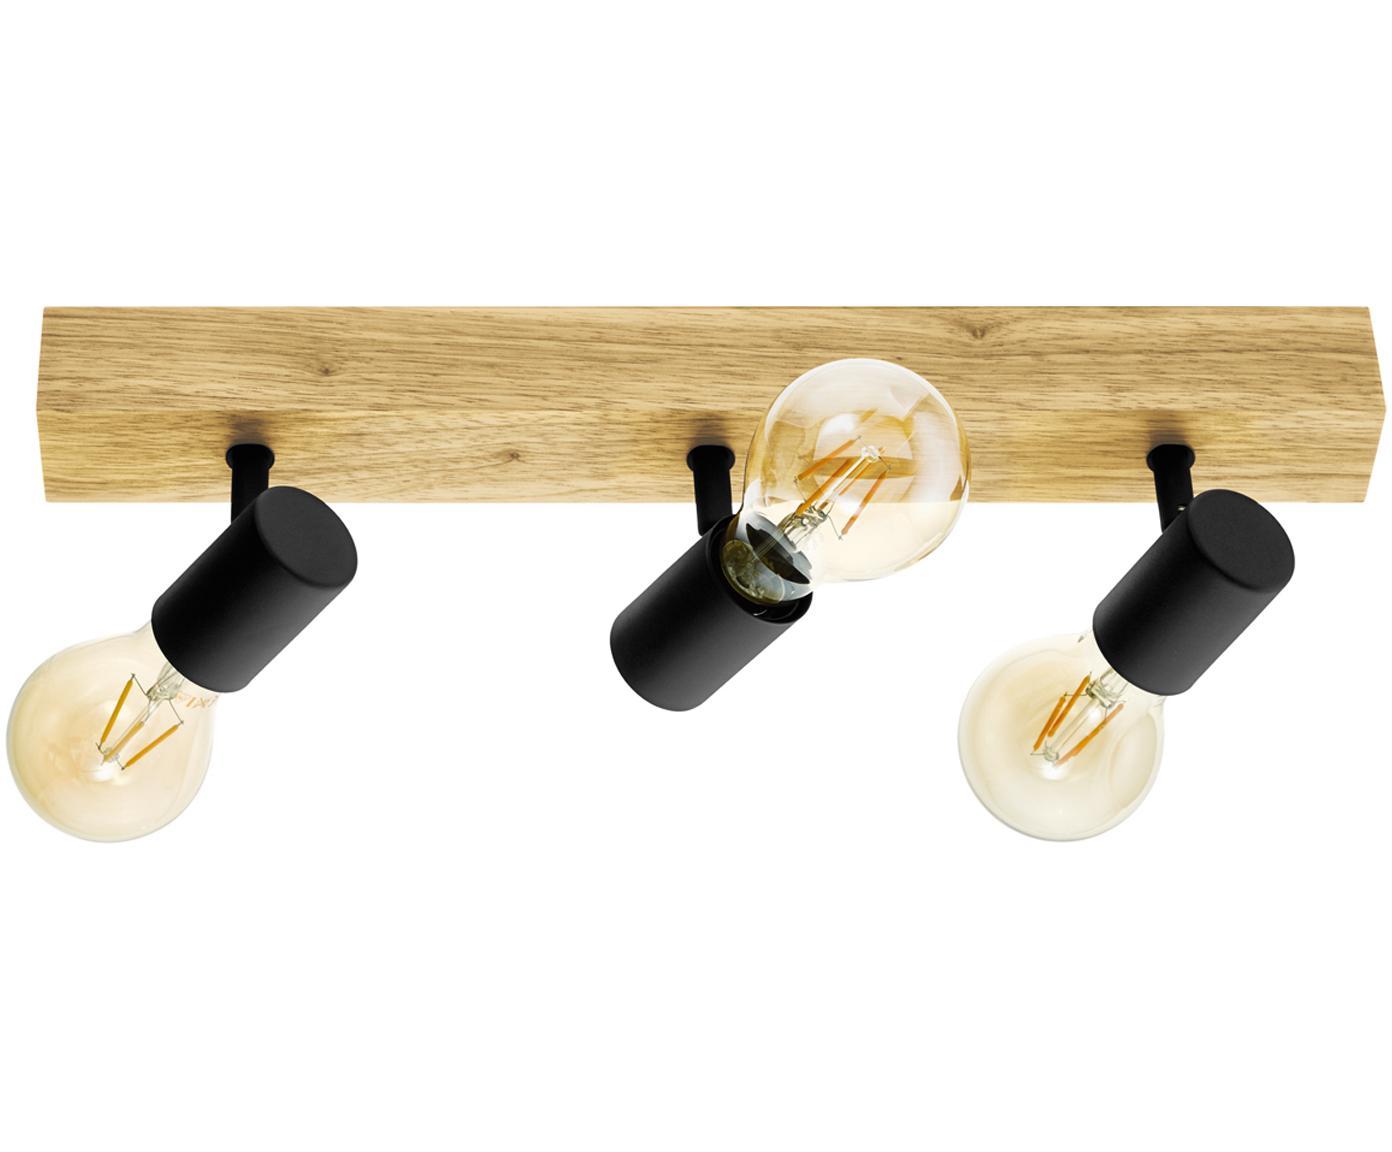 Riel Townshend, Barra: madera, Negro, madera, An 48 x Al 13 cm